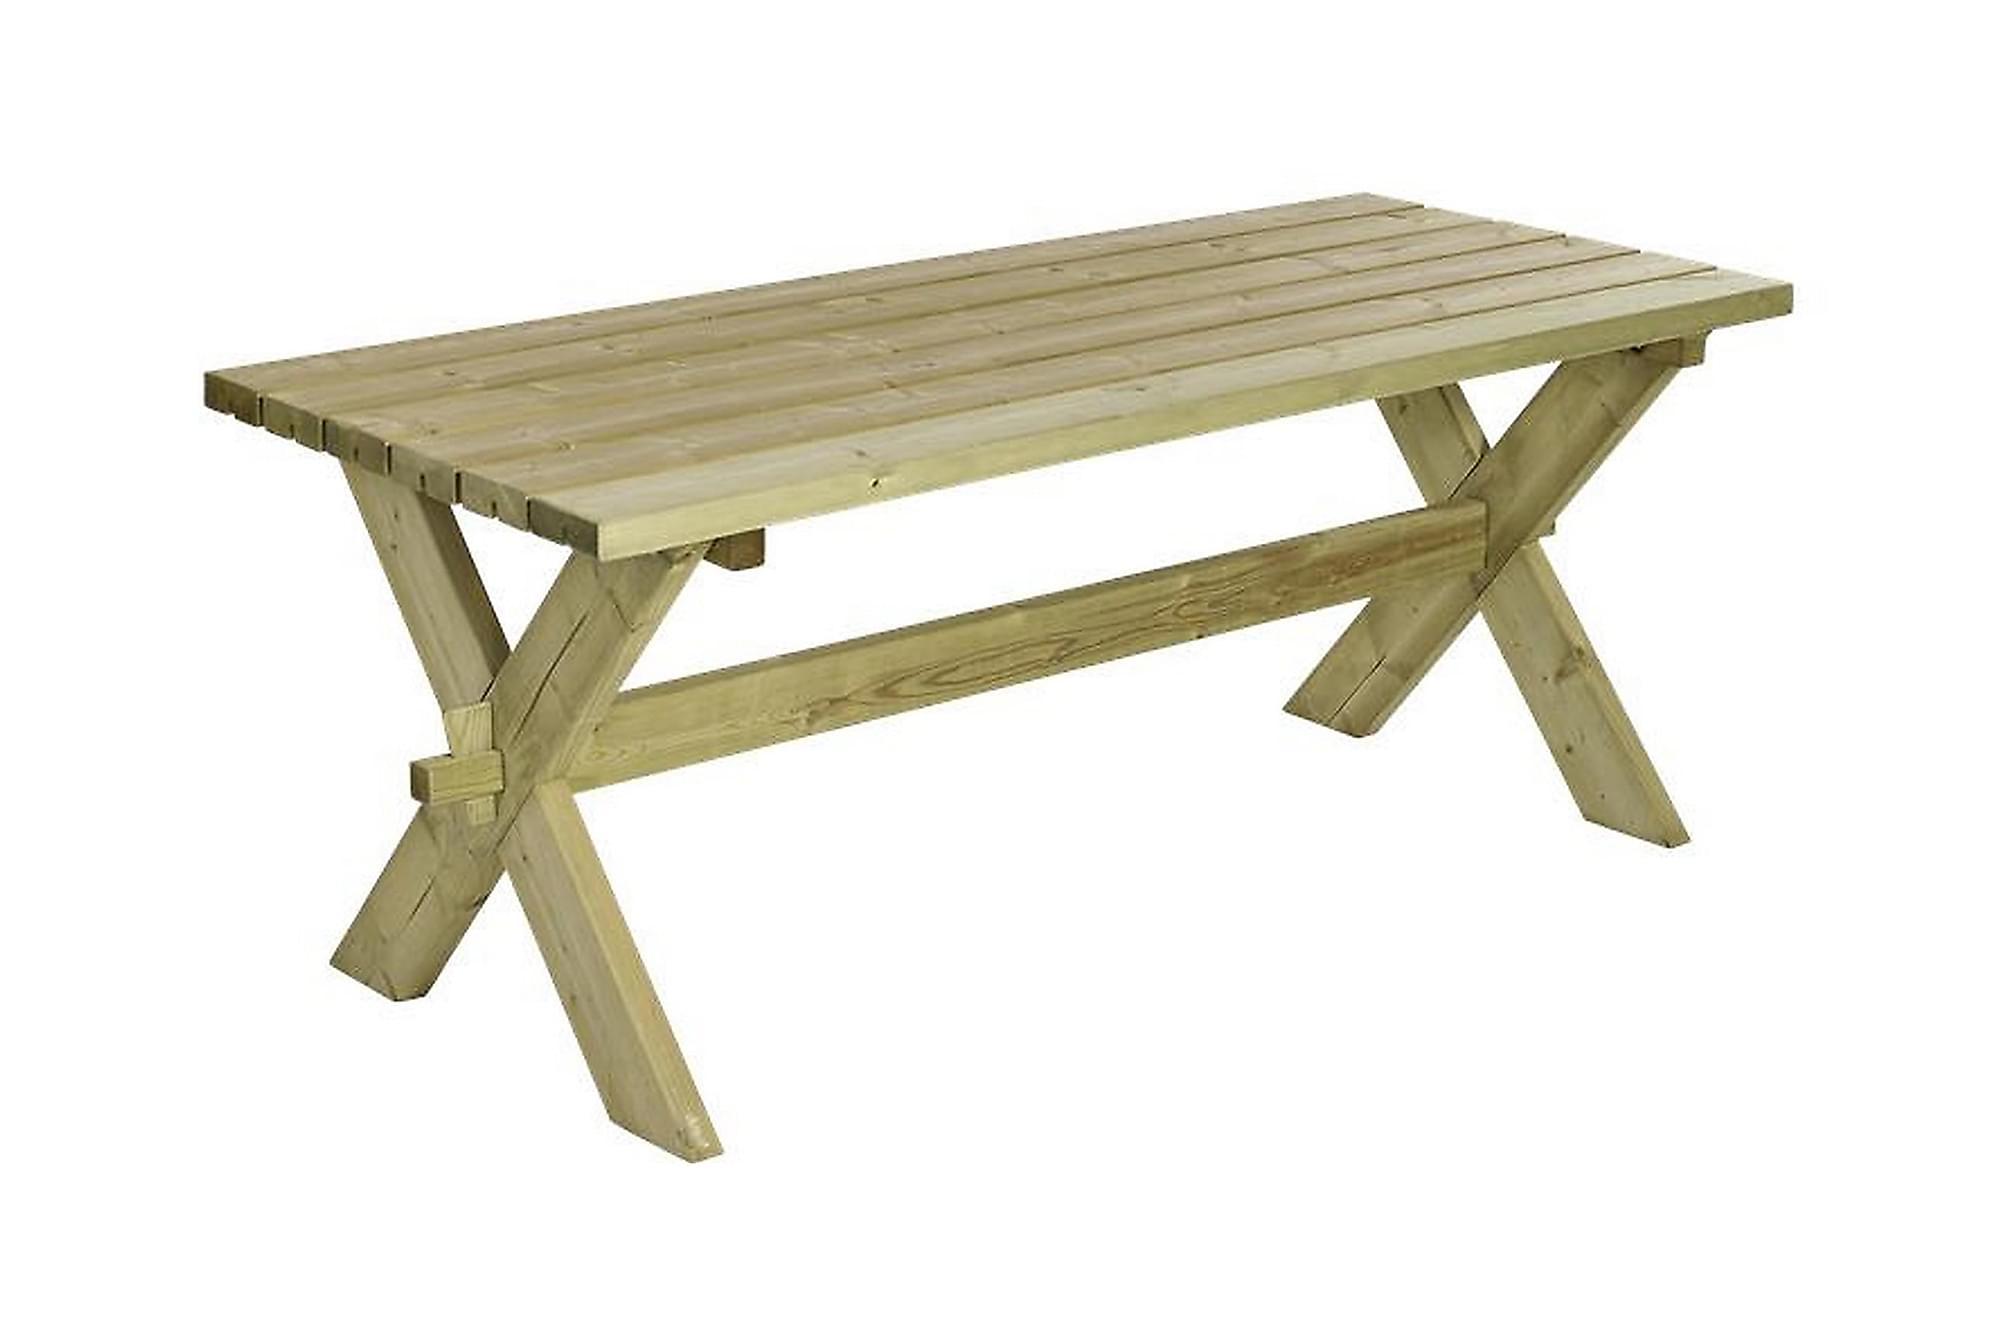 NOSTALGI Plankbord 177x76 Trä, Träbord